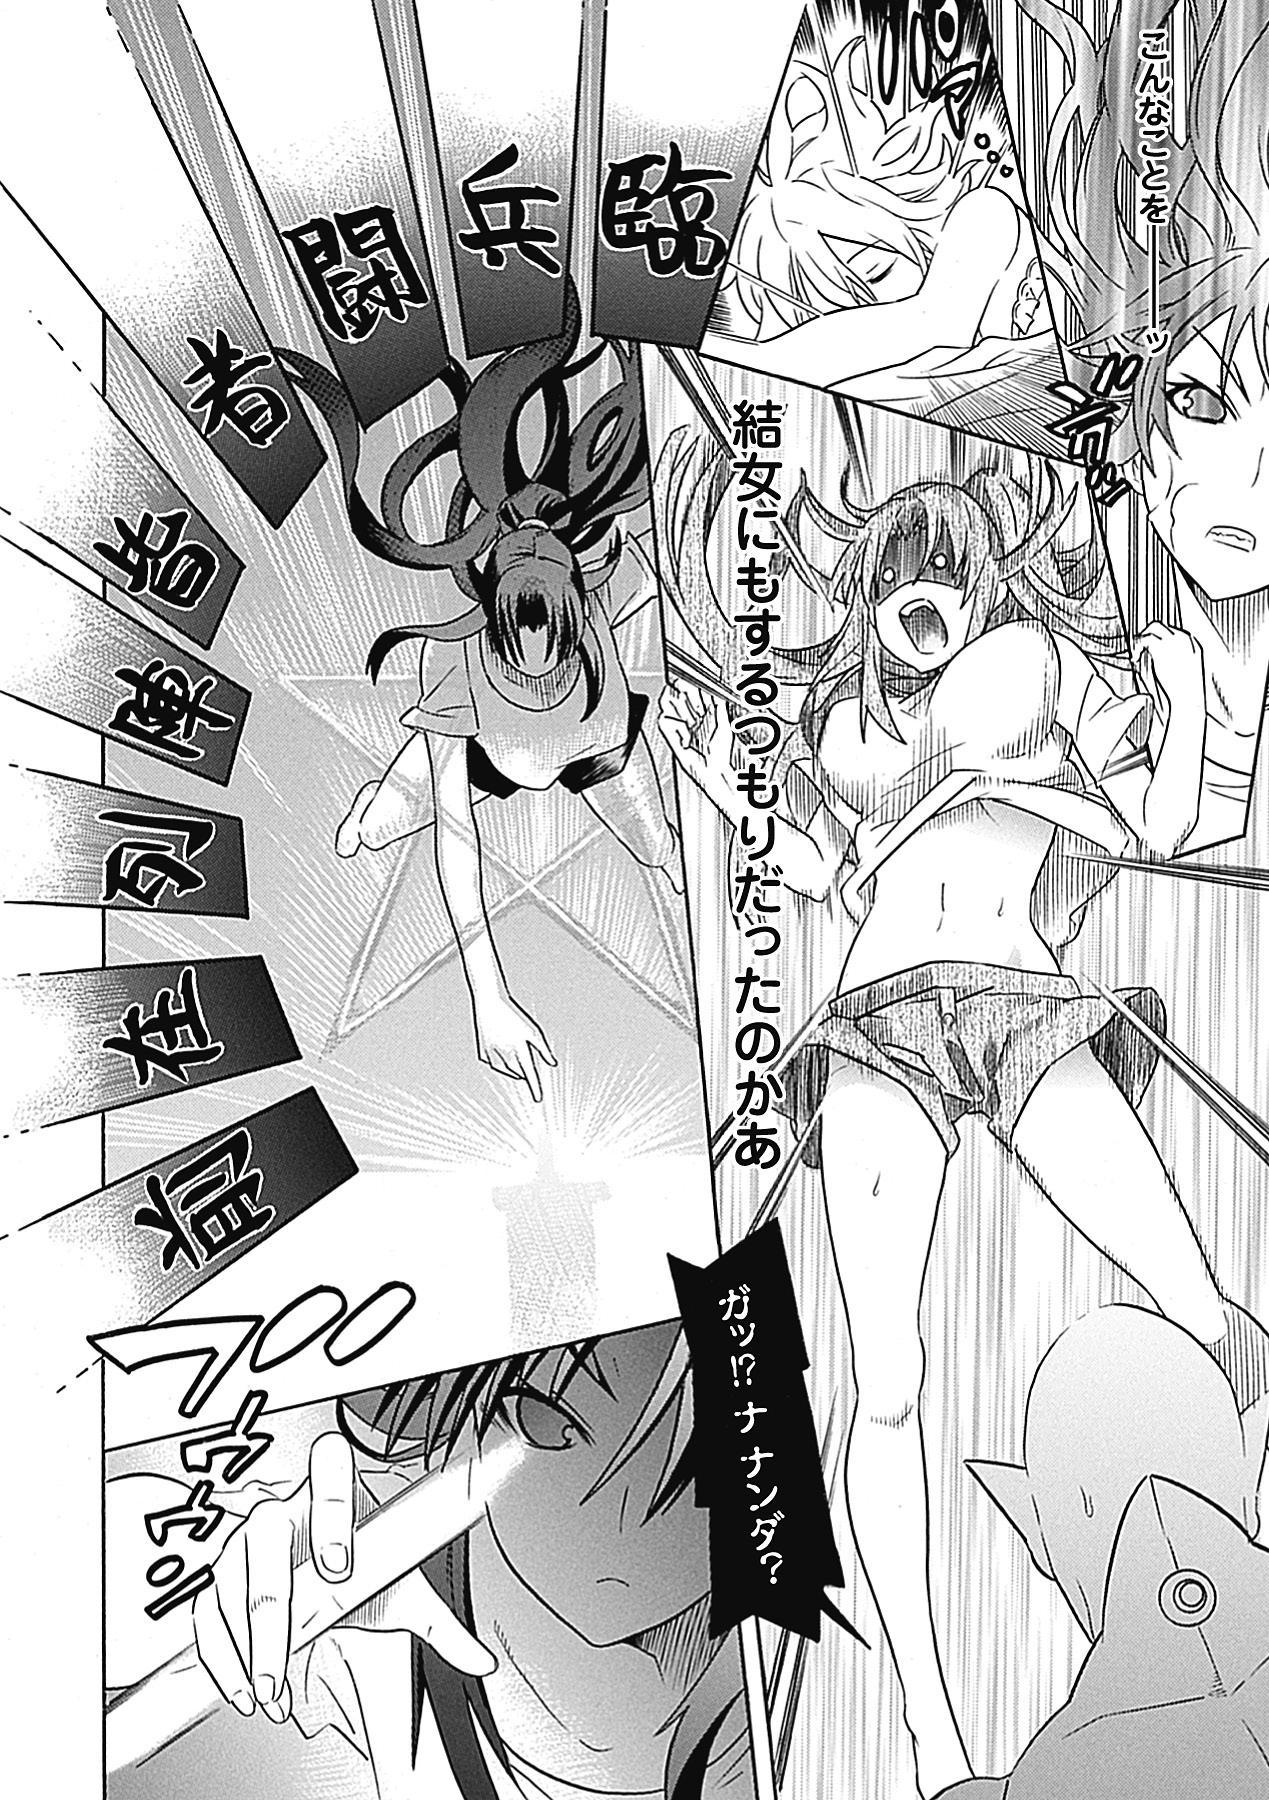 Megami Crisis 1 68